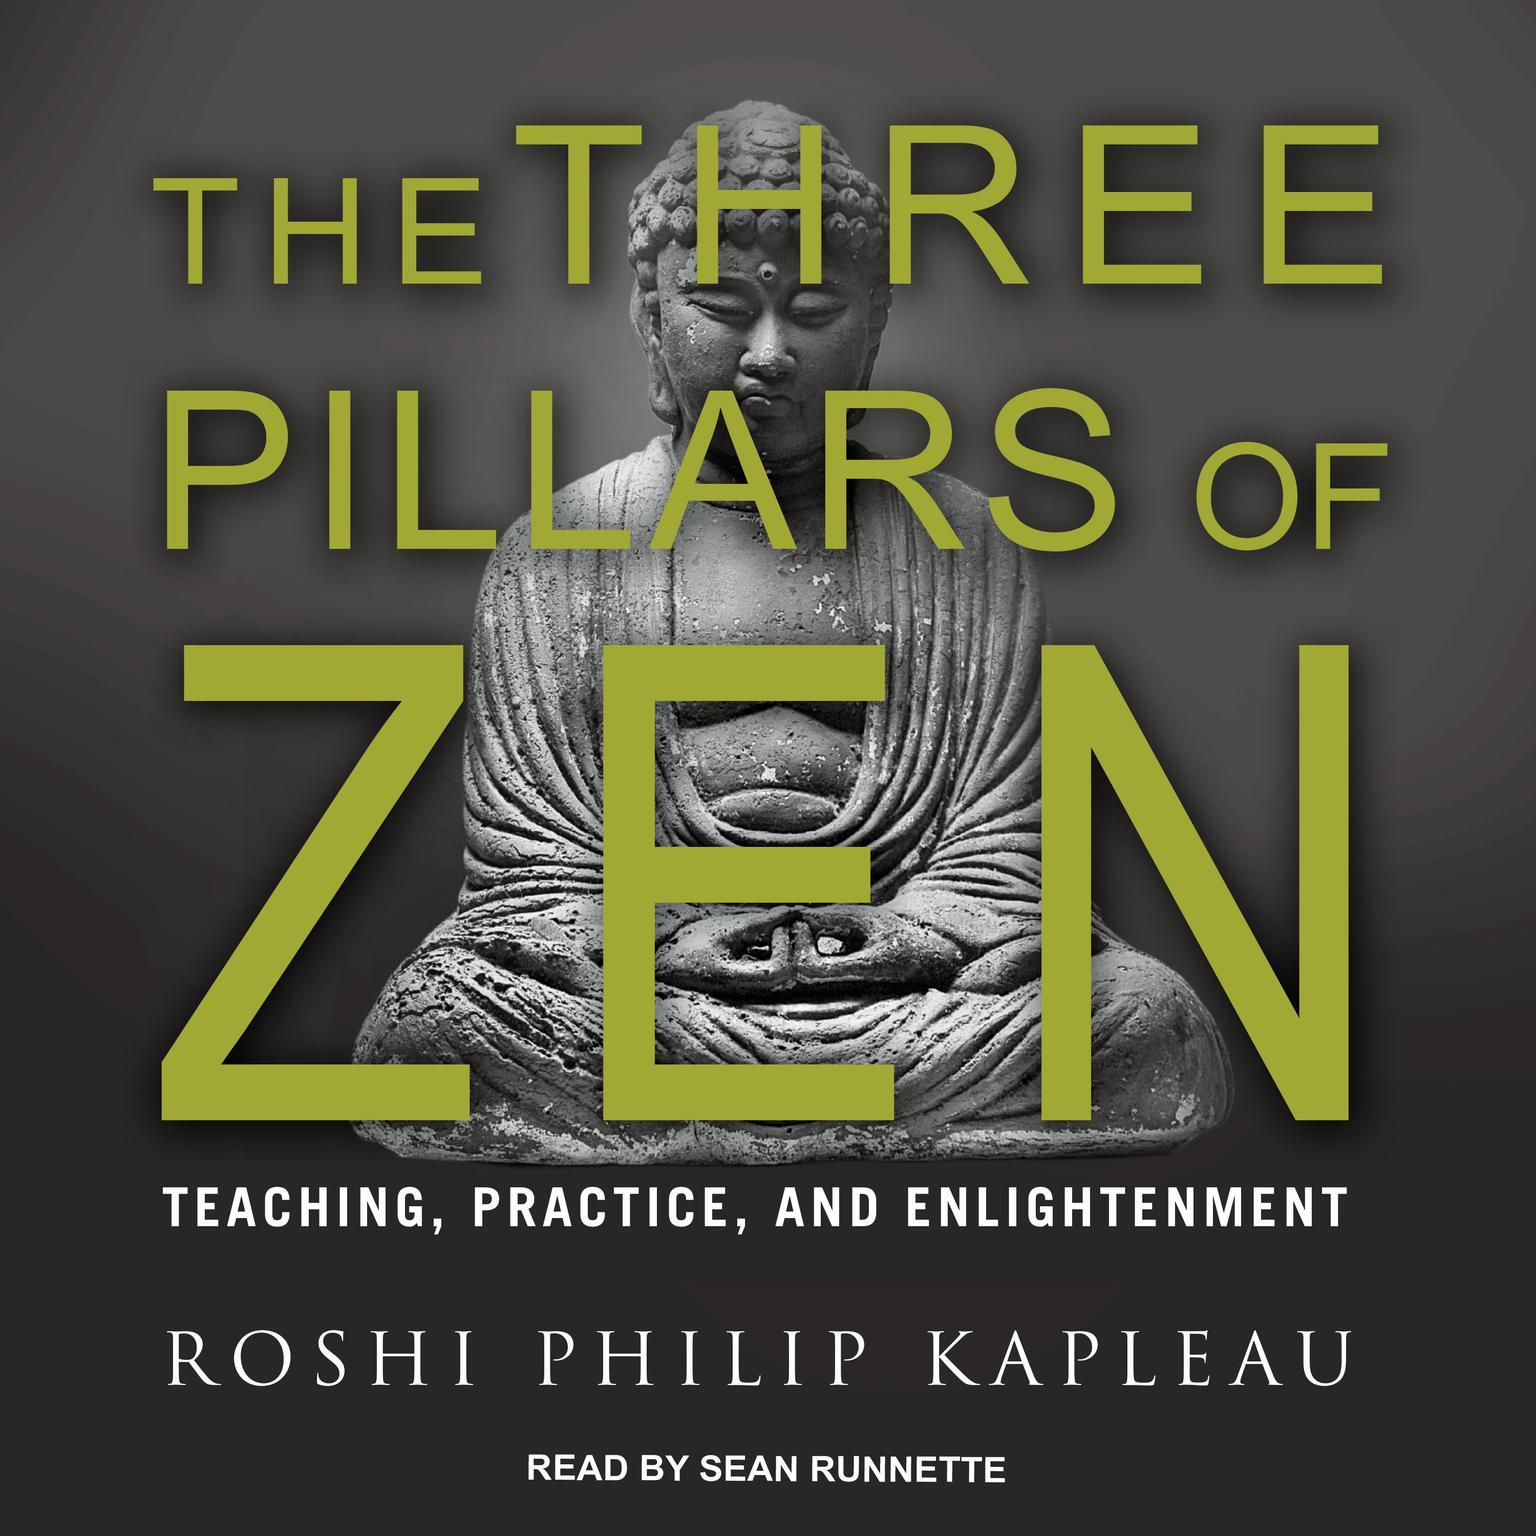 The Three Pillars of Zen: Teaching, Practice, and Enlightenment Audiobook, by Roshi Philip Kapleau